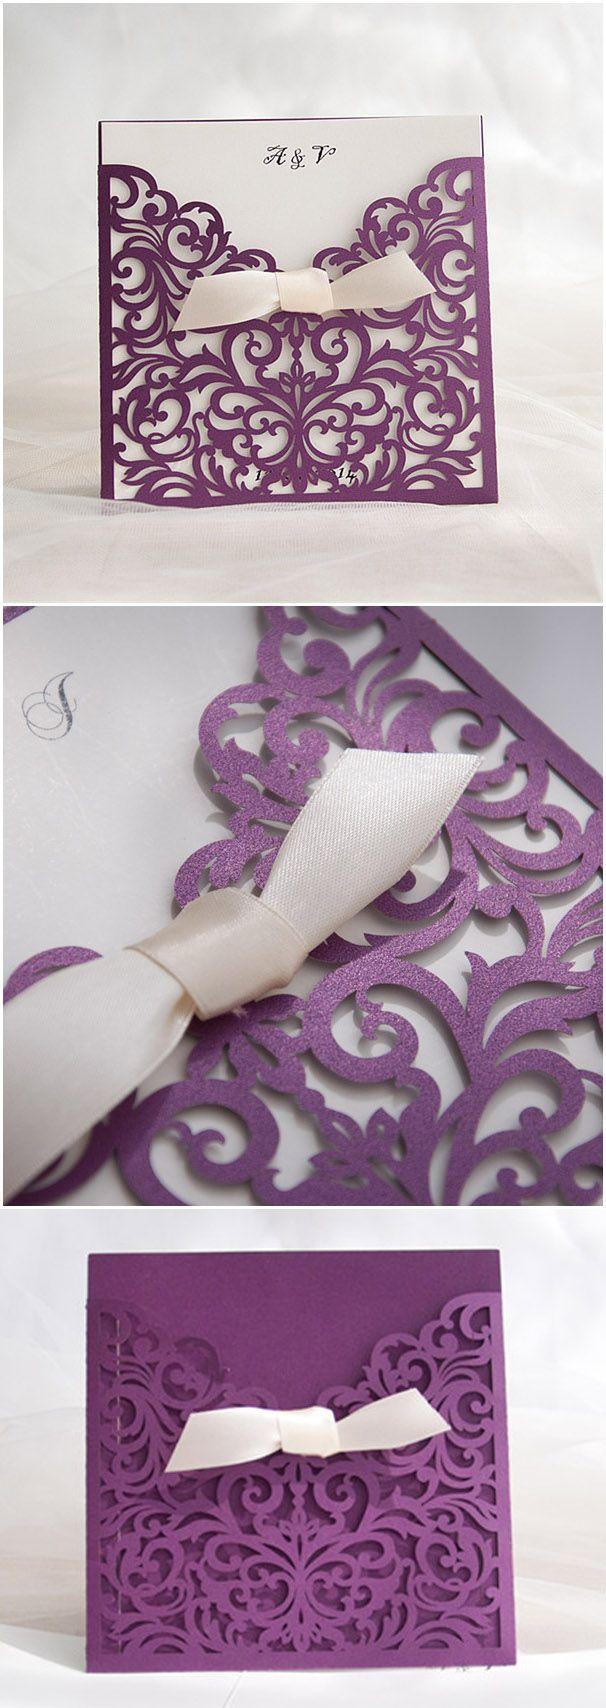 chic purple and ivory laser cut wedding invitations